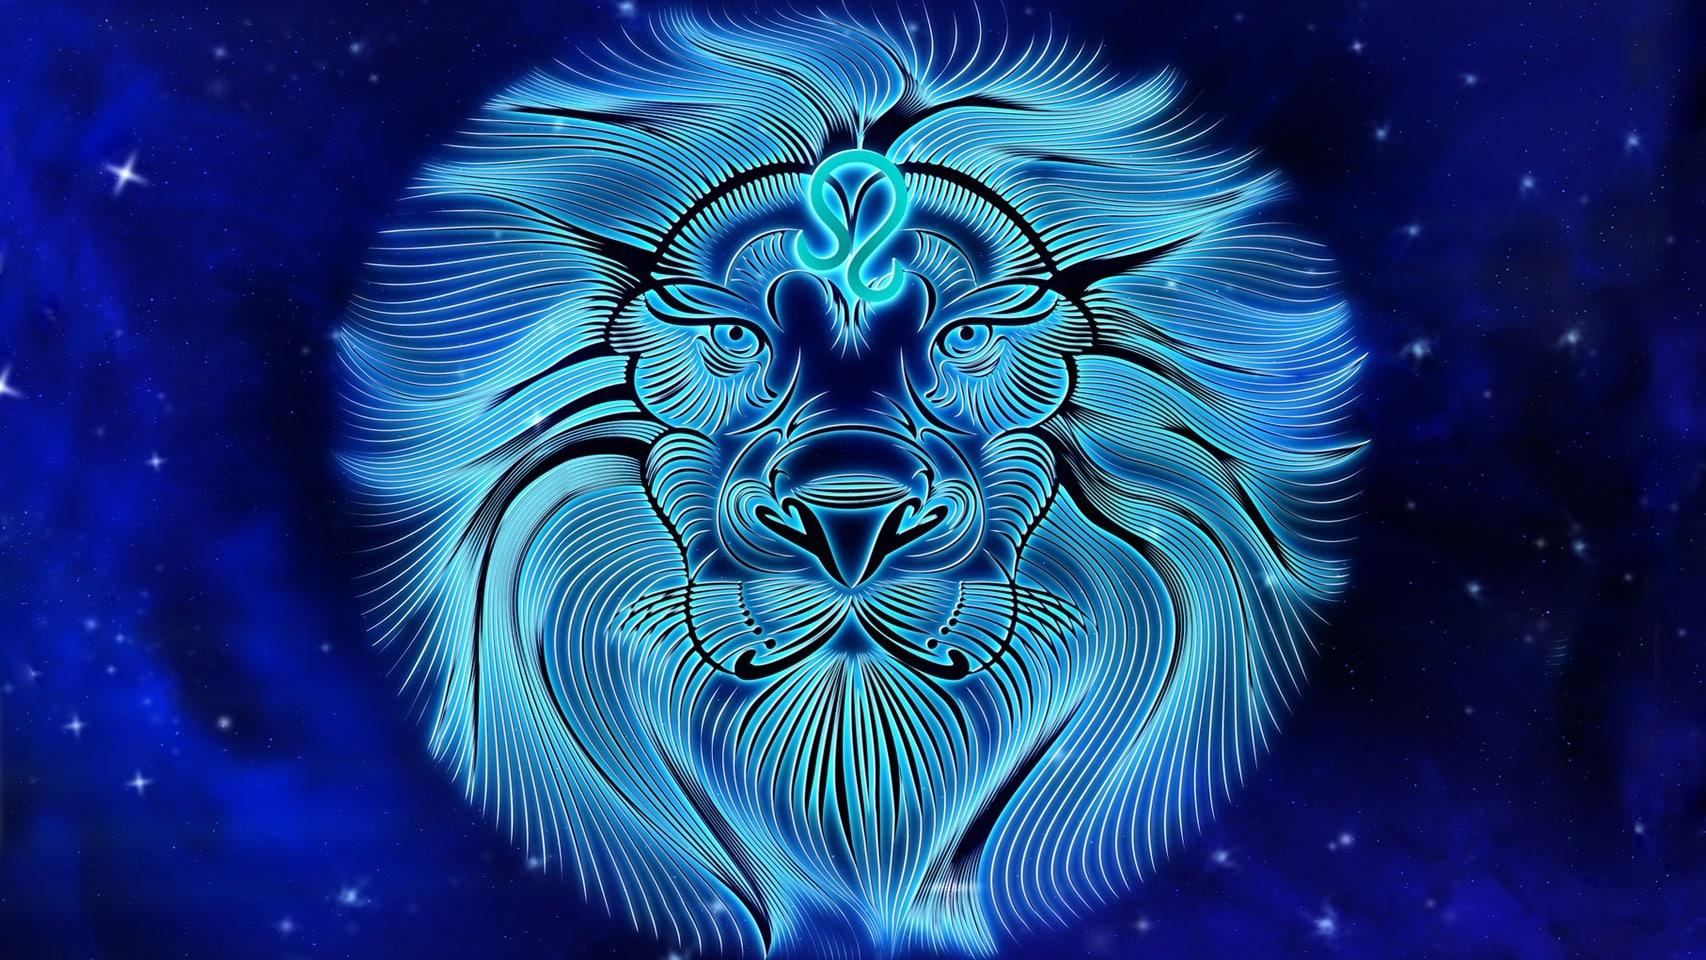 Signo de Leão - Características e personalidade dos leoninos